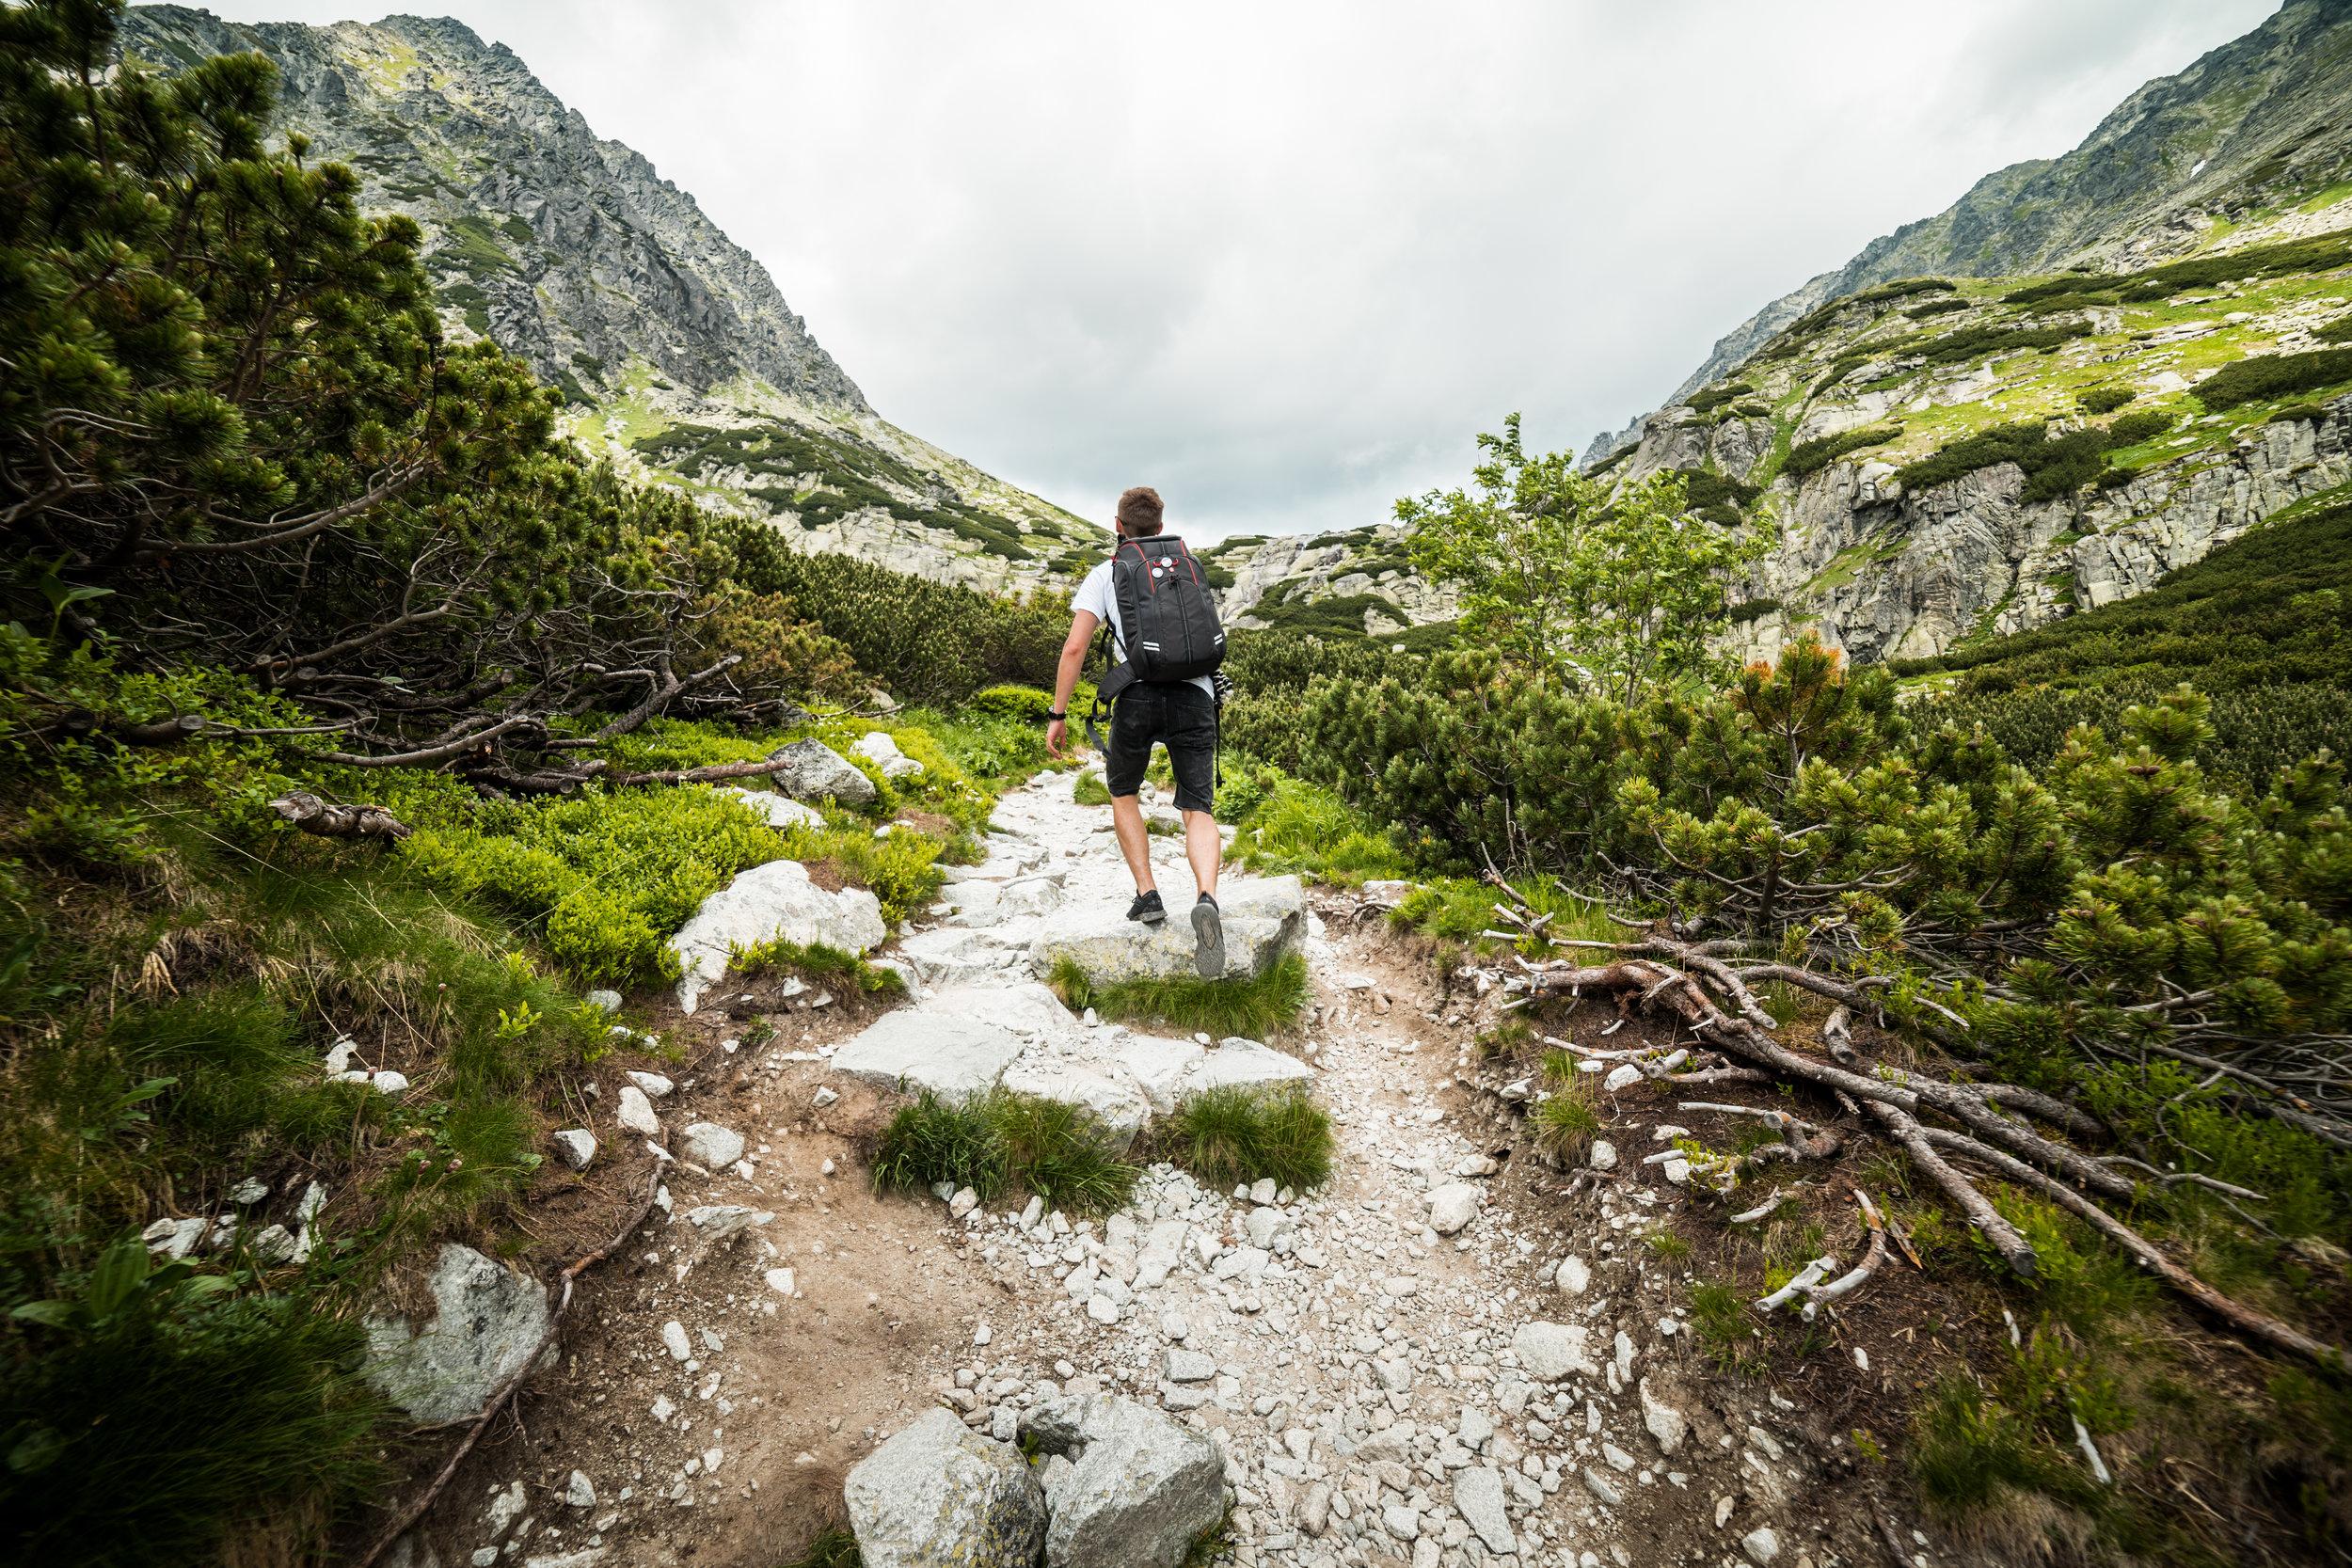 man-hiking-alone-in-mountains-picjumbo-com.jpg